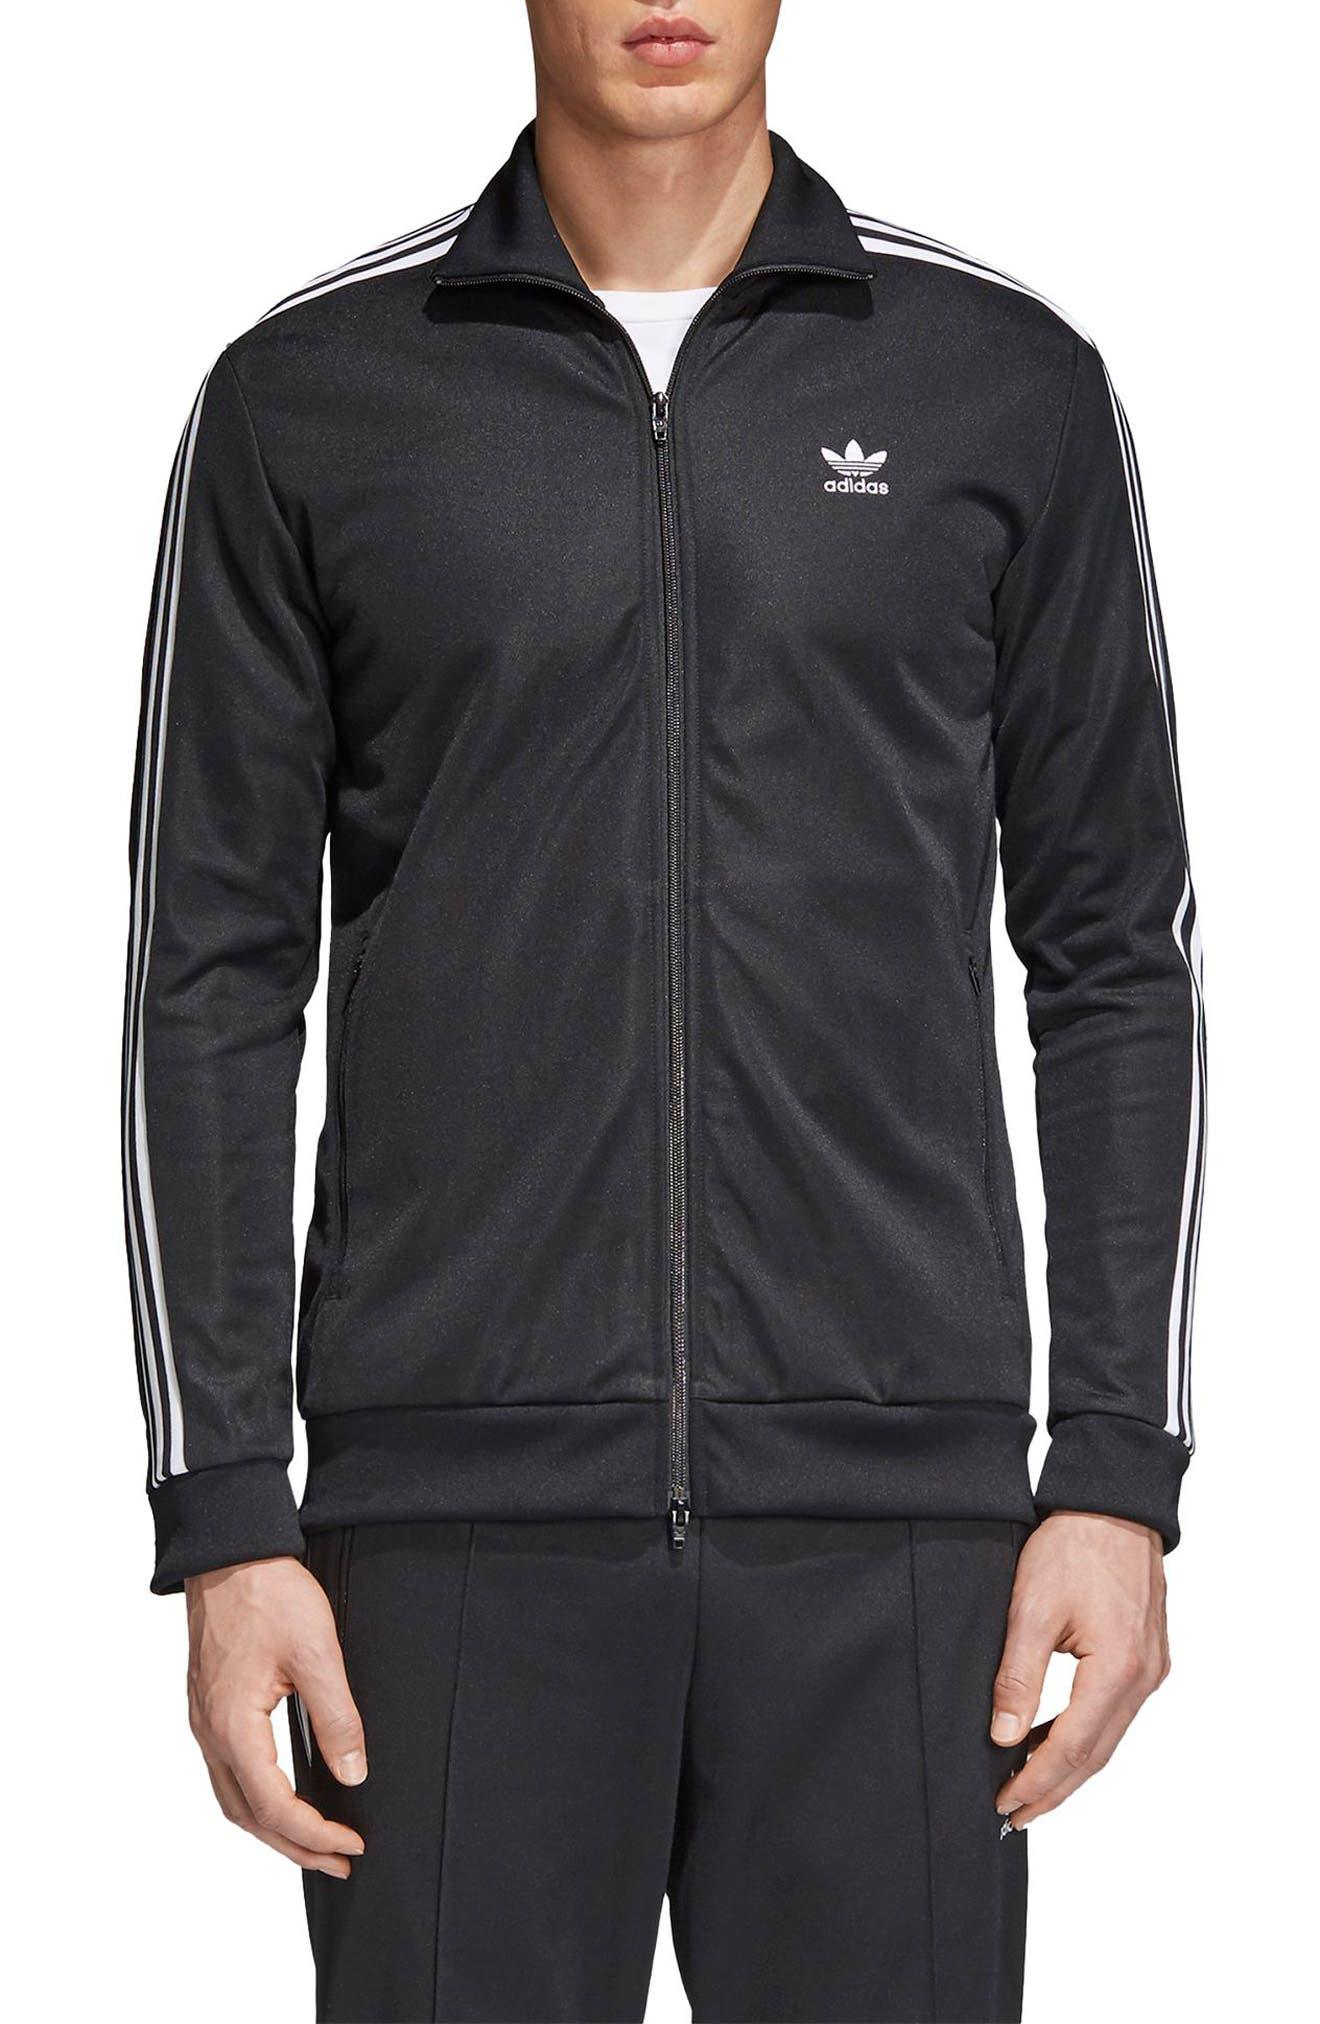 adidas Originals Beckenbauer Track Jacket